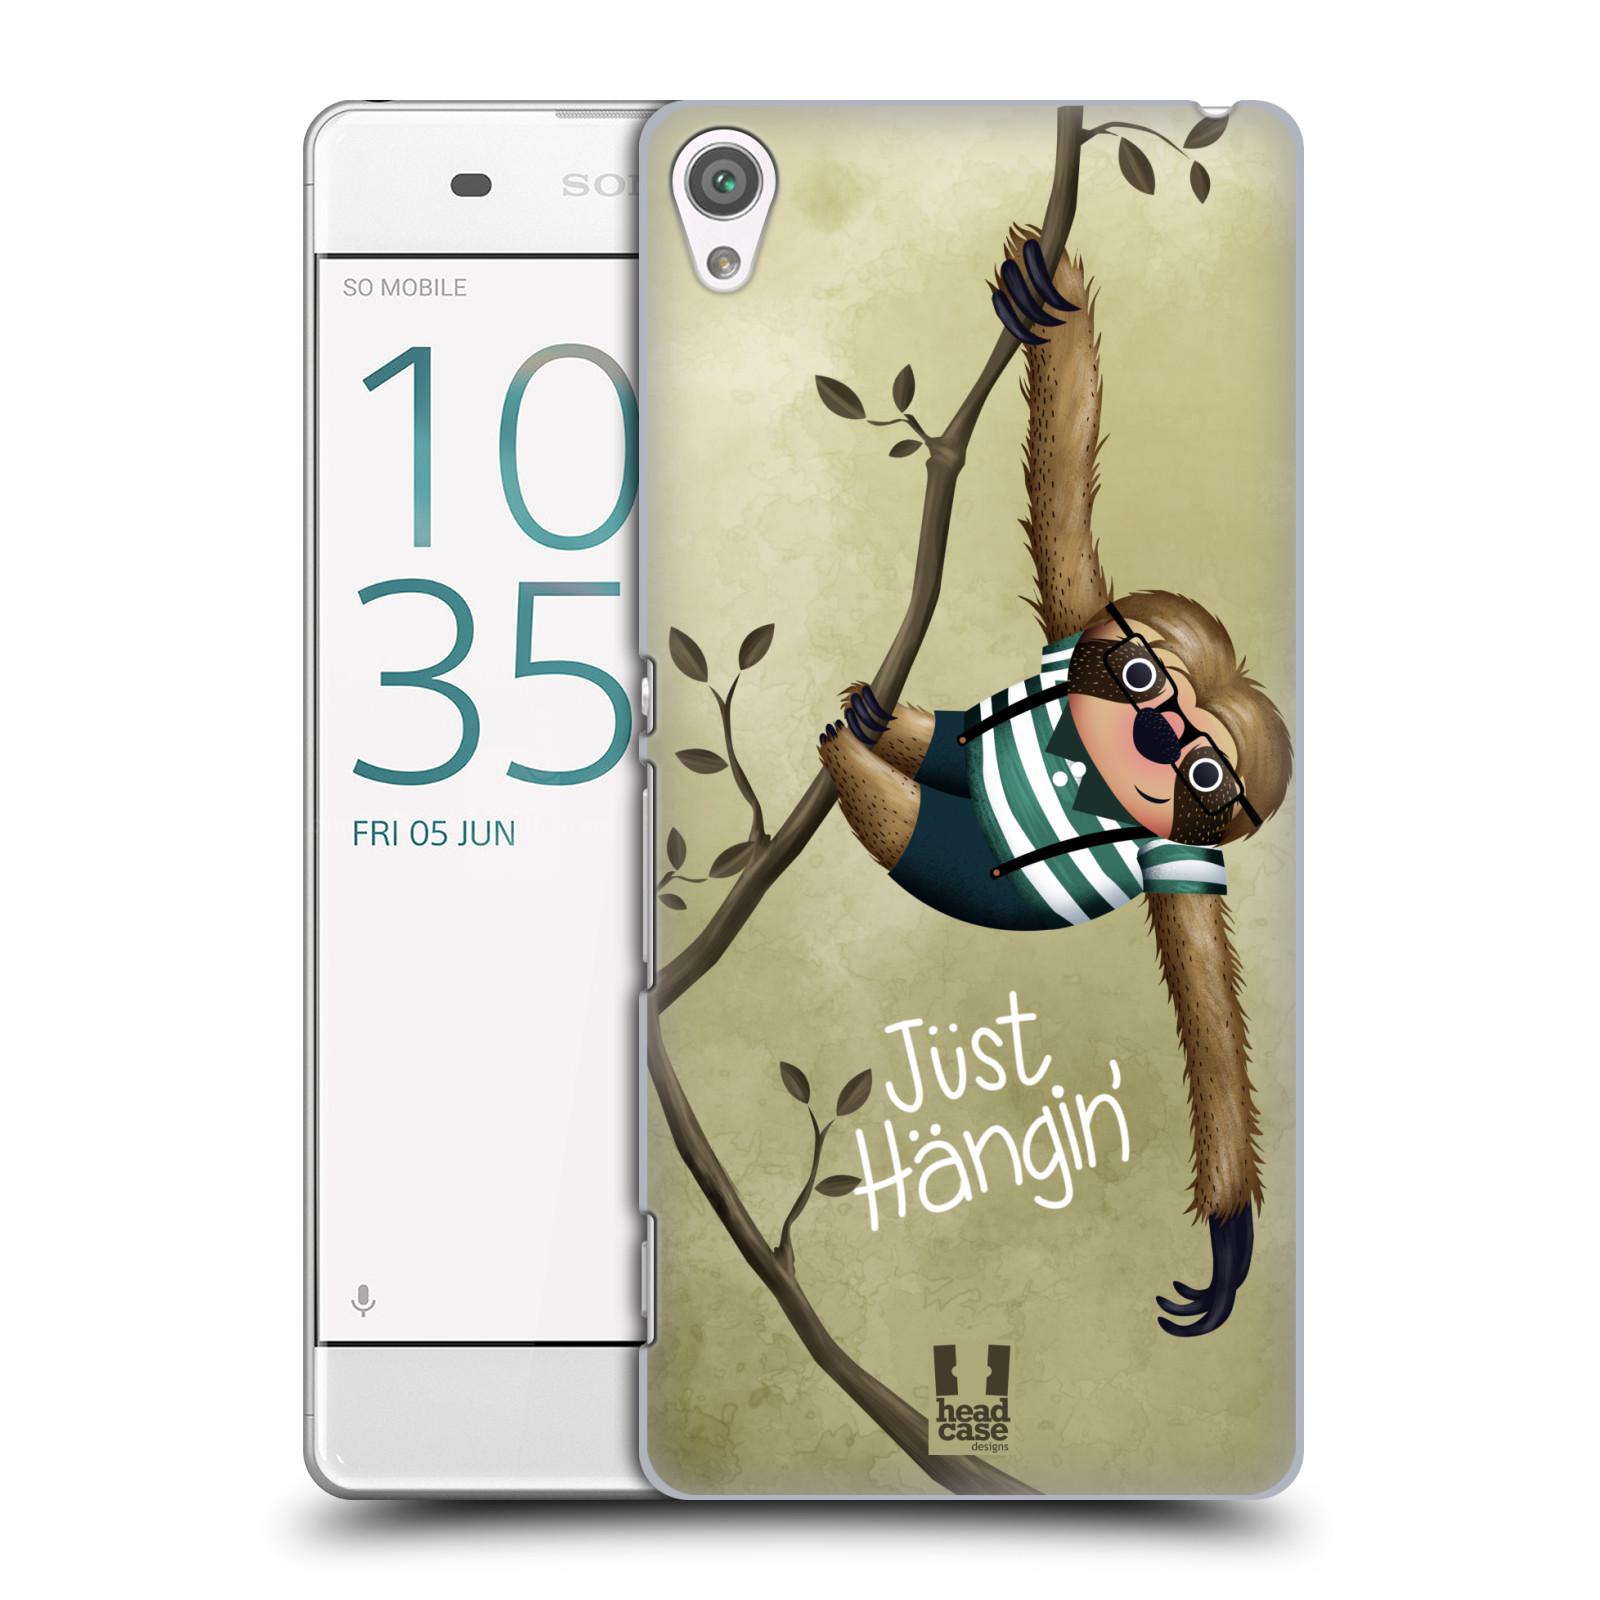 Plastové pouzdro na mobil Sony Xperia XA HEAD CASE Lenochod Just Hangin